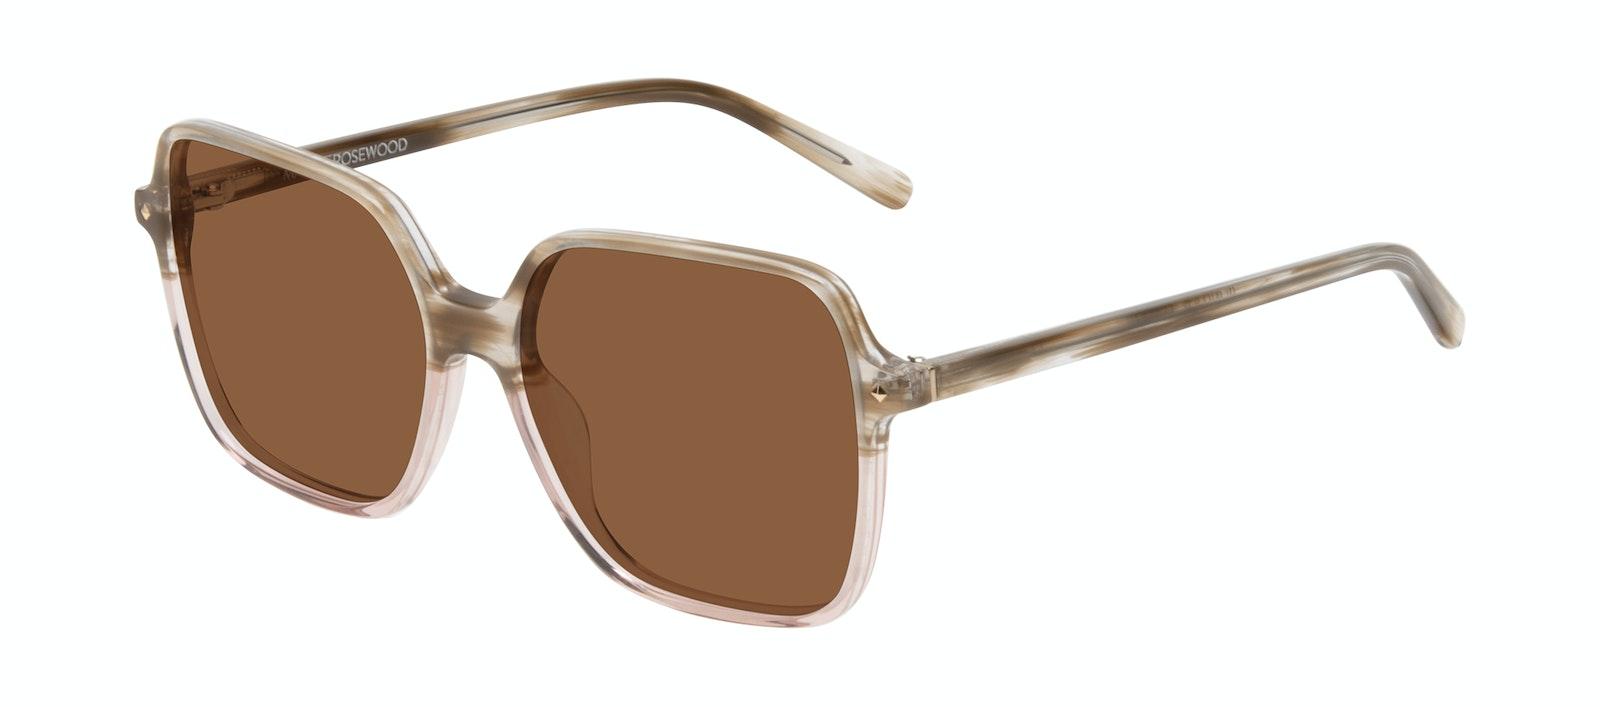 Affordable Fashion Glasses Square Sunglasses Women Major Rosewood Tilt